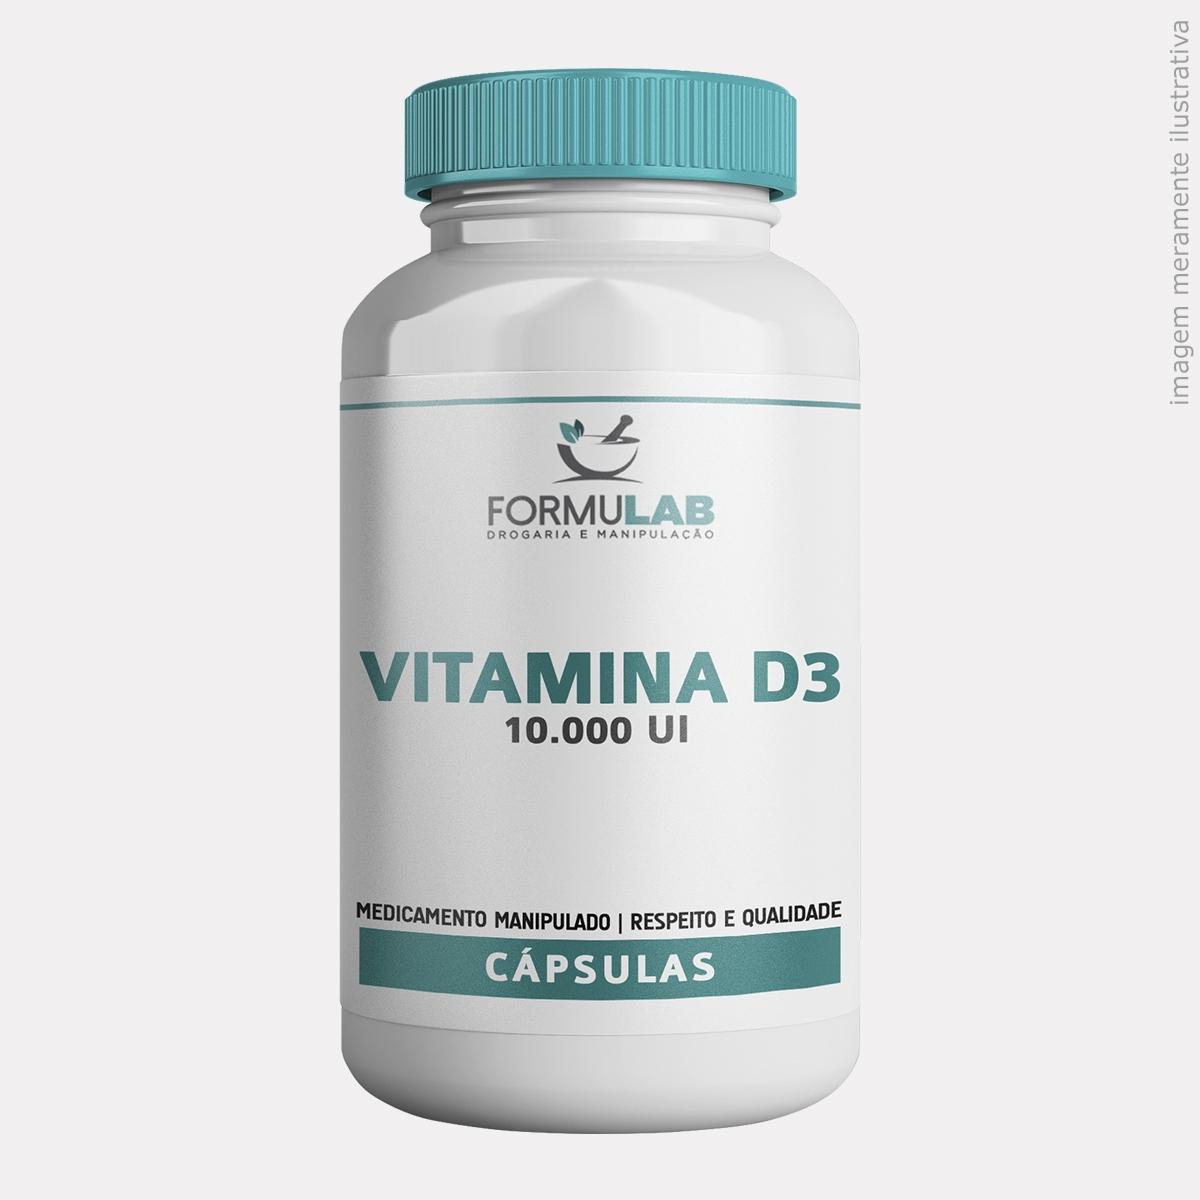 Vitamina D3 10.000 UI - Colecalciferol 10000ui